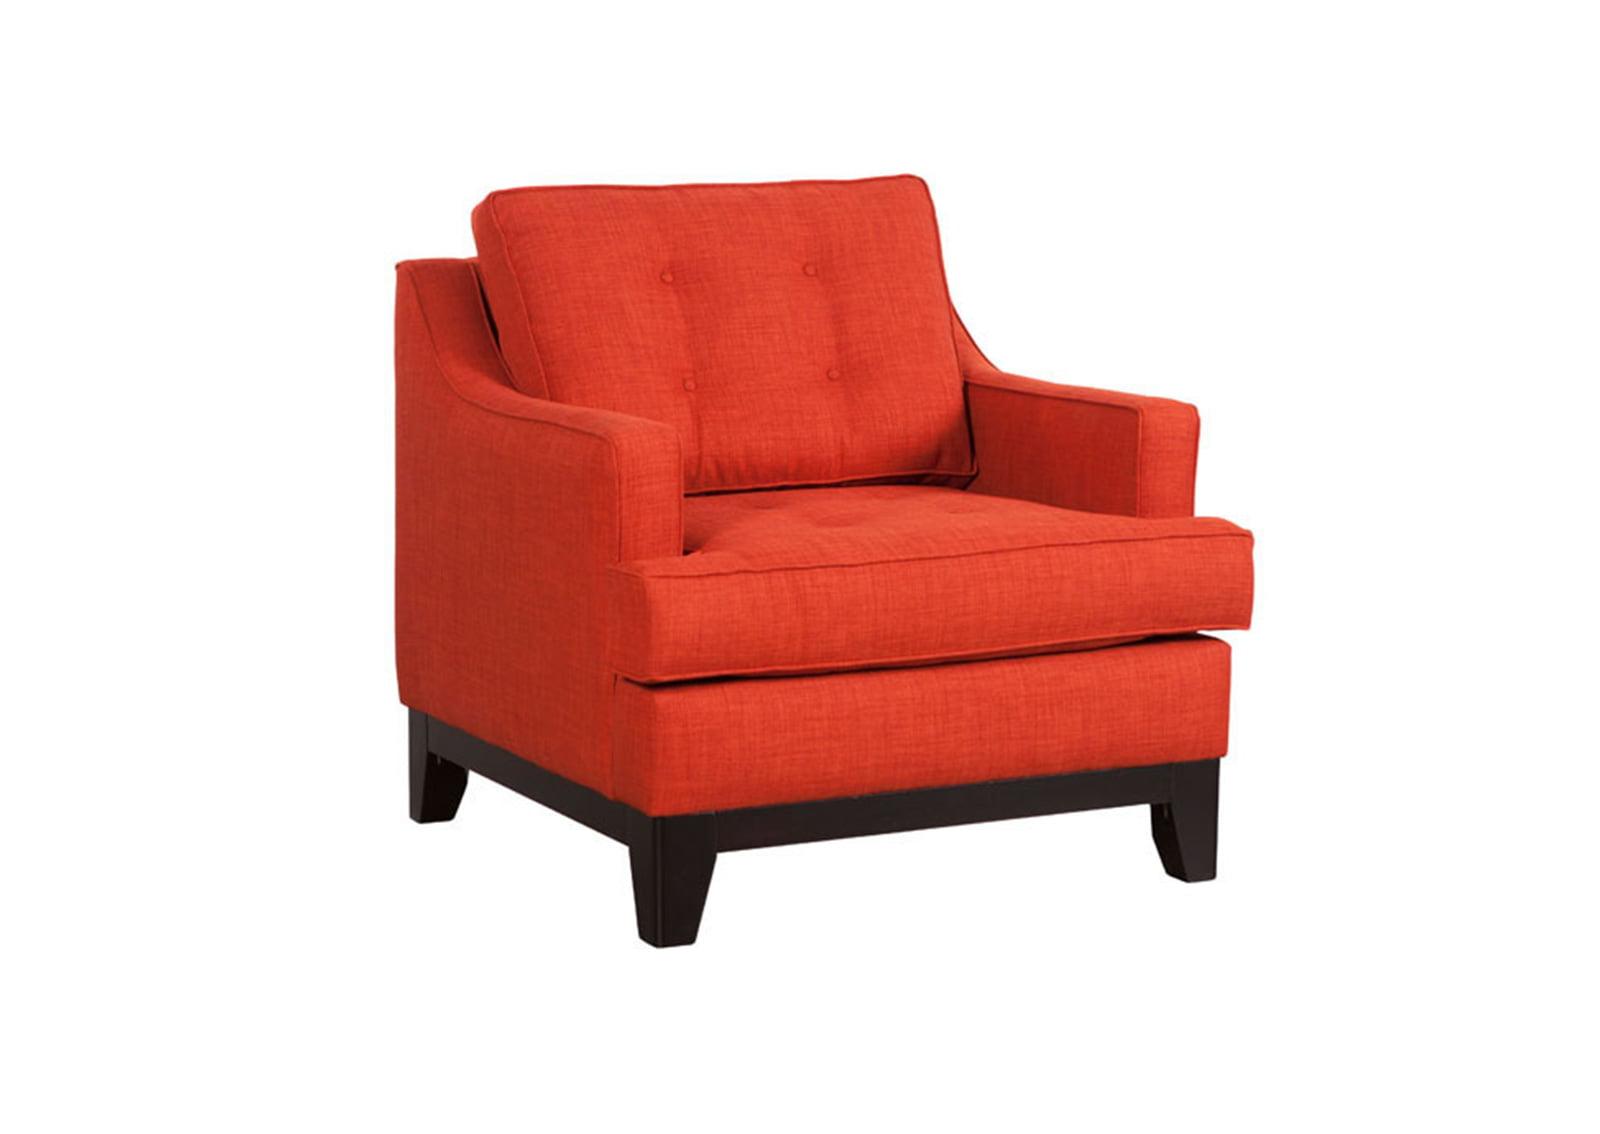 Chicago-Arm-Chair-Burnt-Orange1